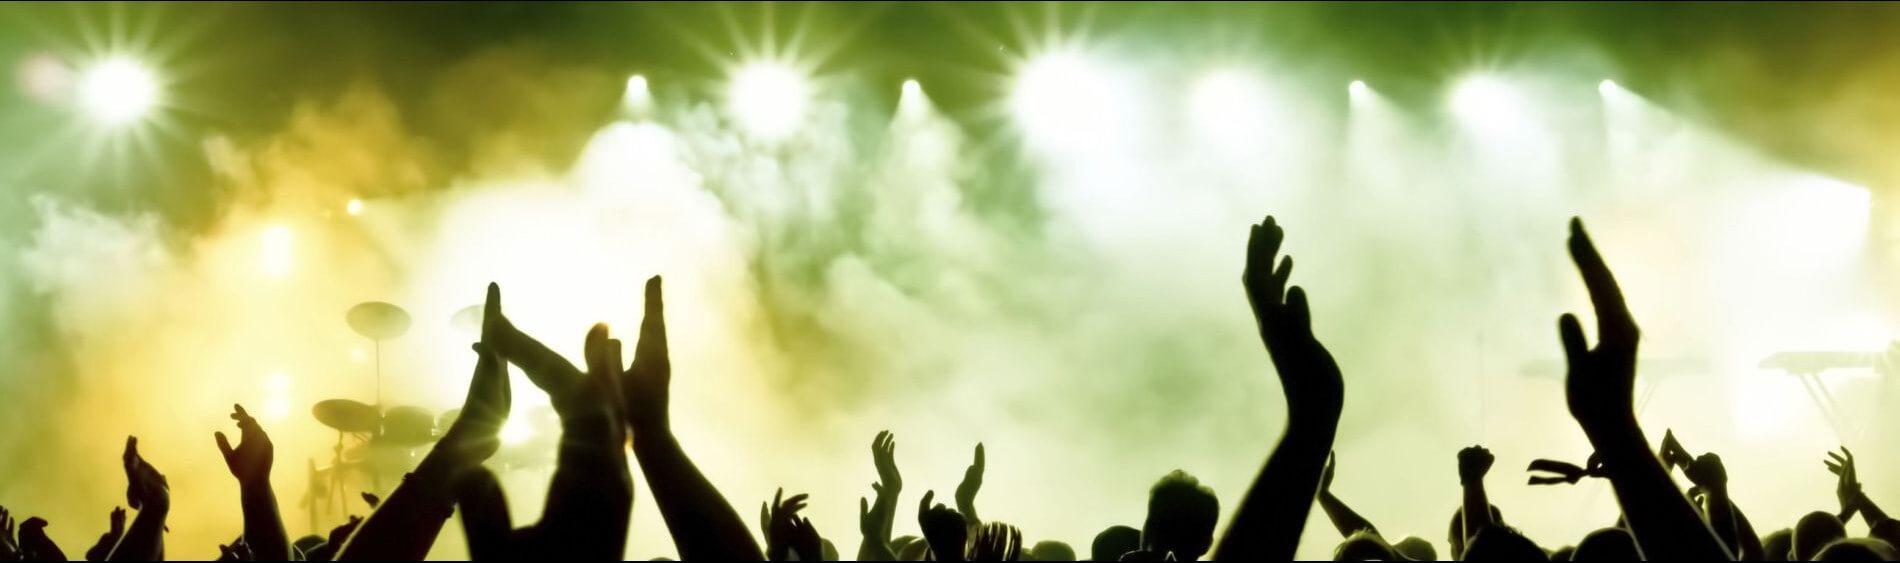 koncert,-rece,-tlum-218490